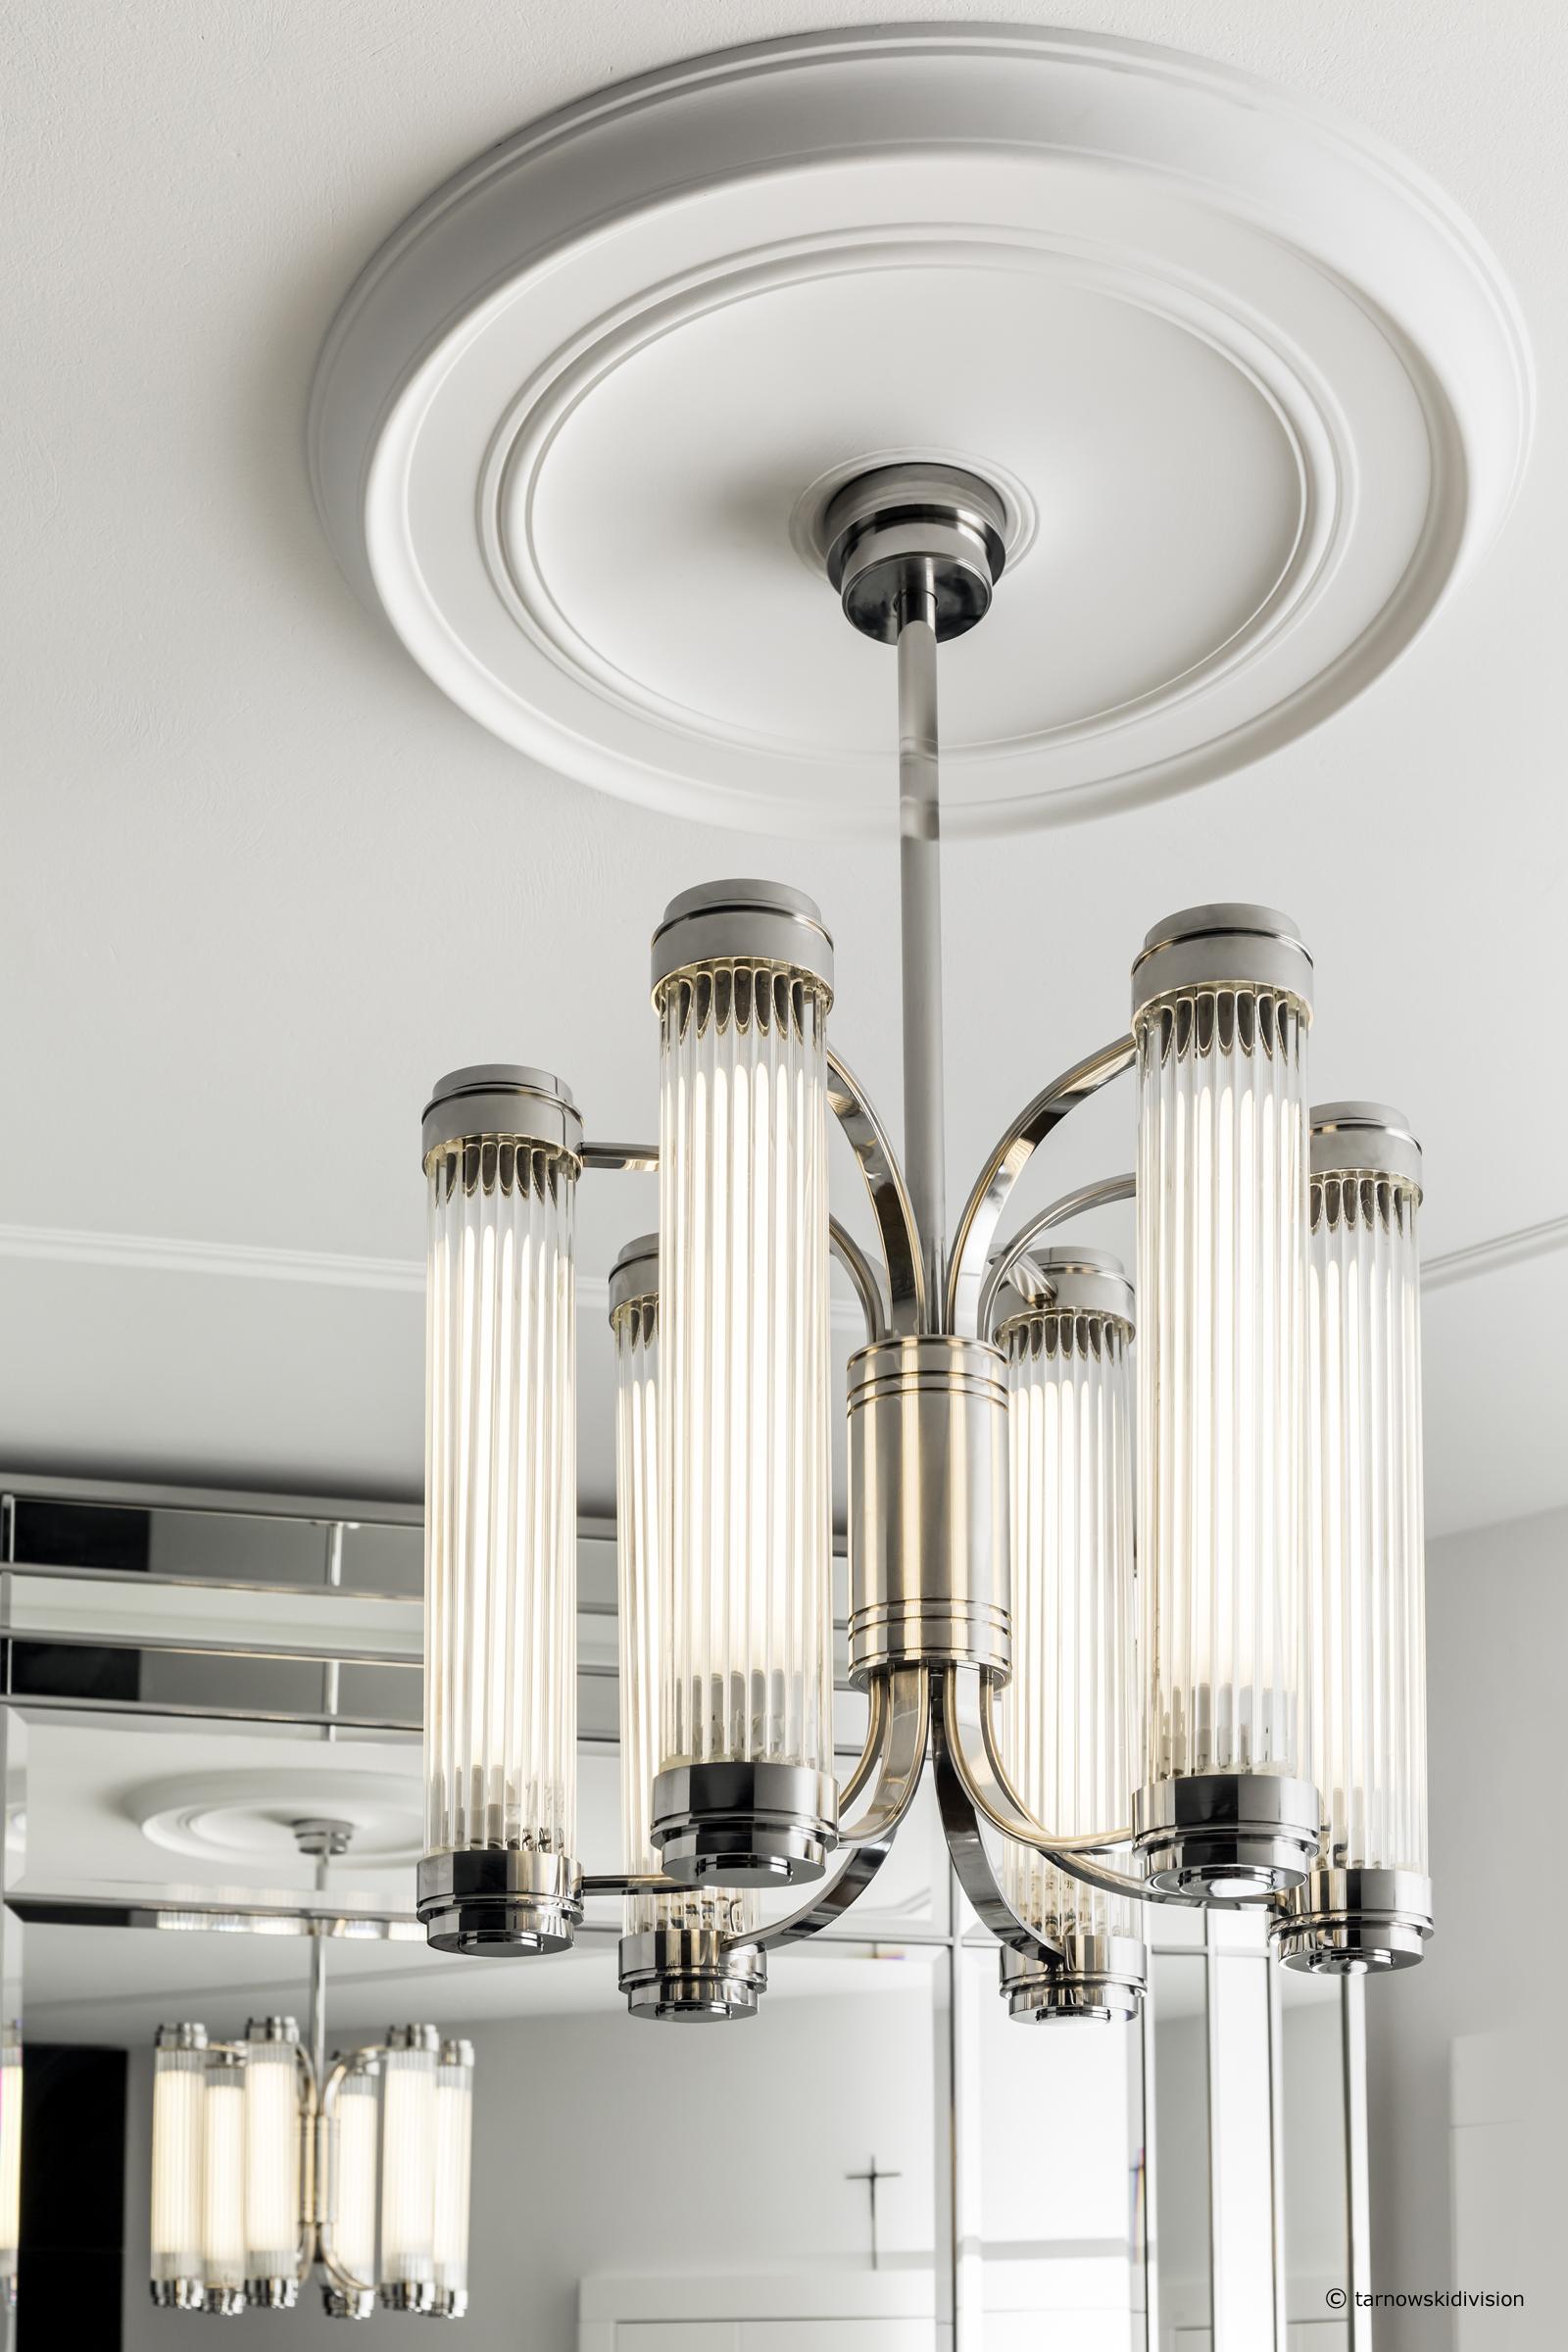 Wspaniały Art Deco lamps   Tarnowski Division CY33